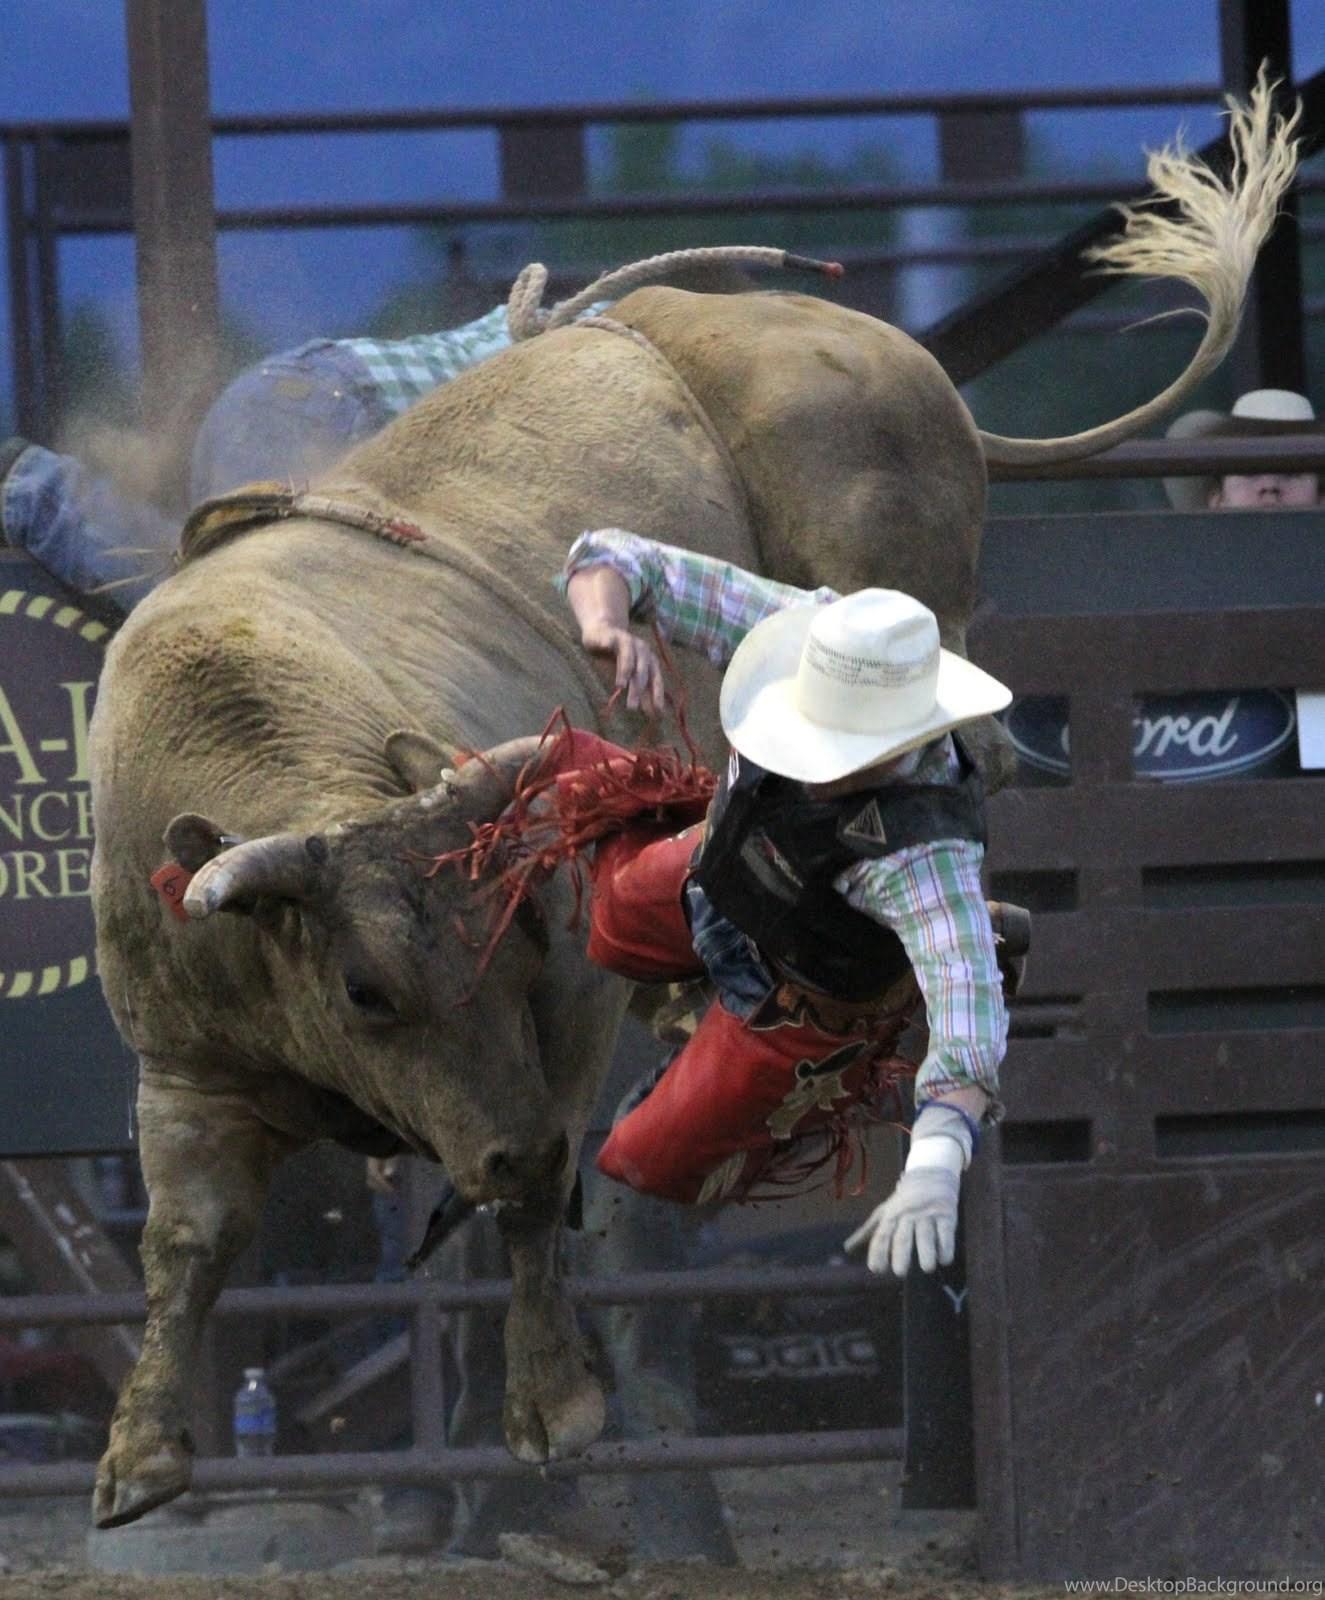 Top pbr bull riding wallpapers desktop background - Bull riding wallpapers ...